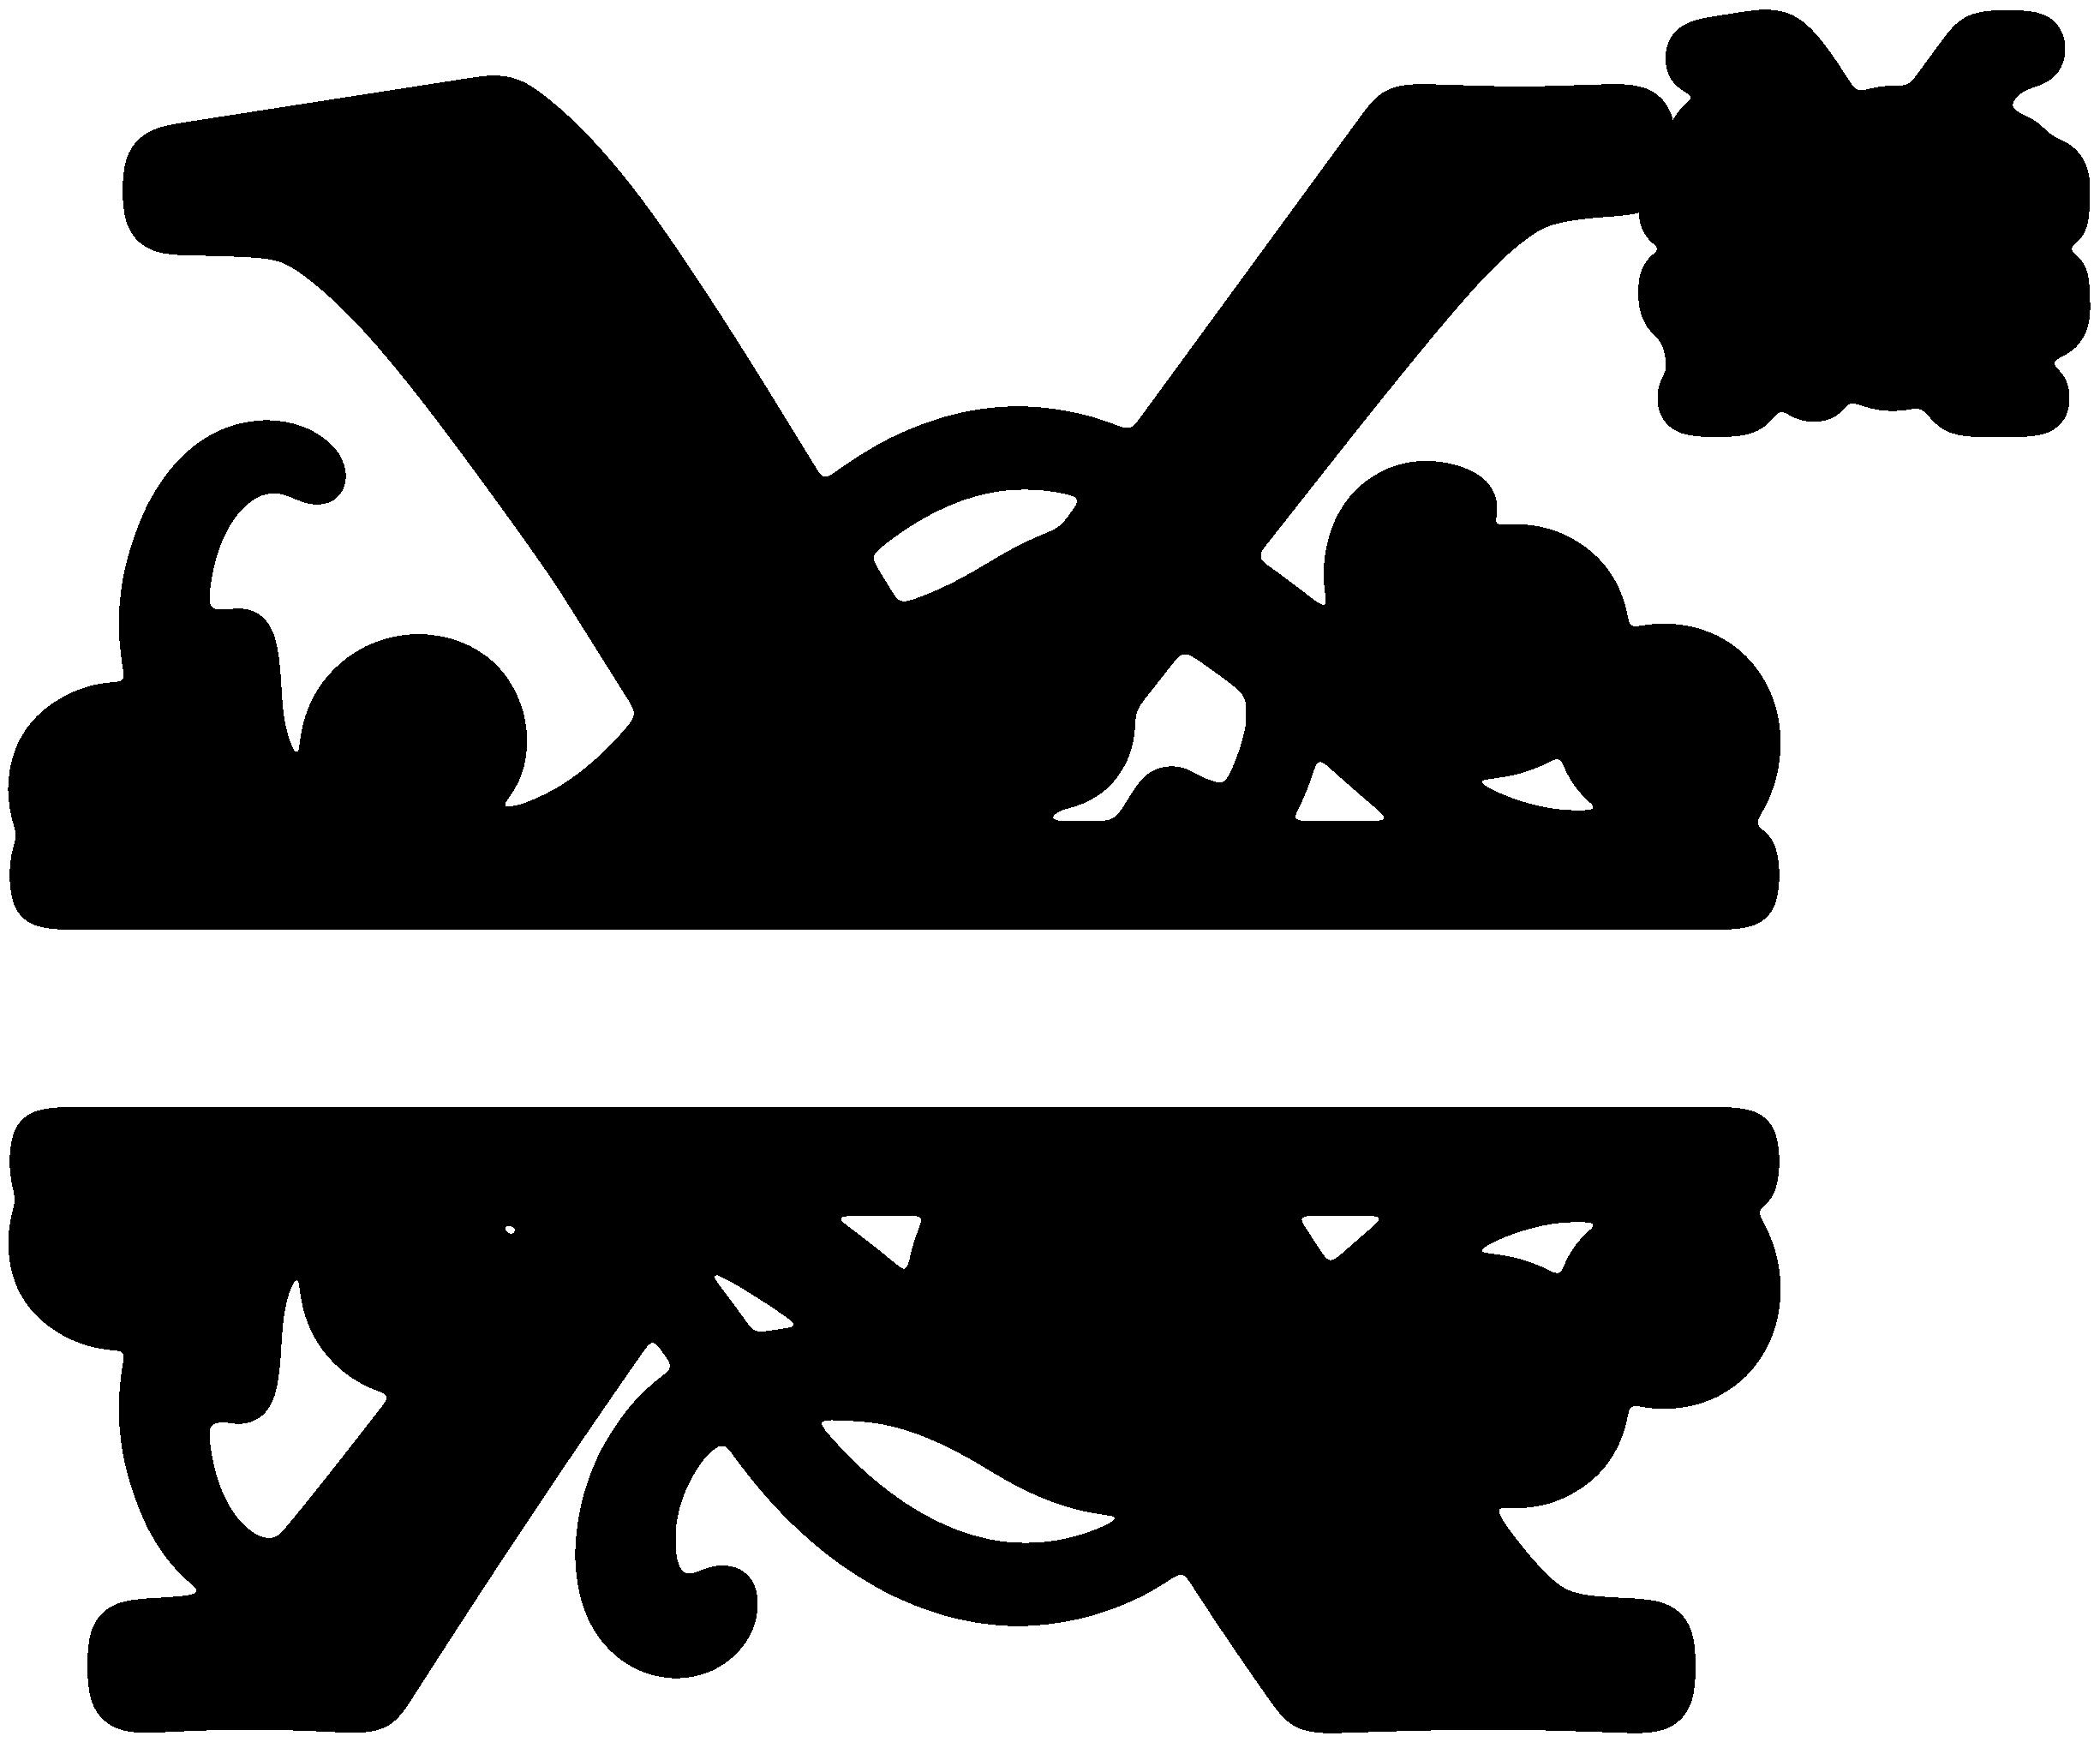 Flourished split x snapdragon. Kitchen clipart monogram